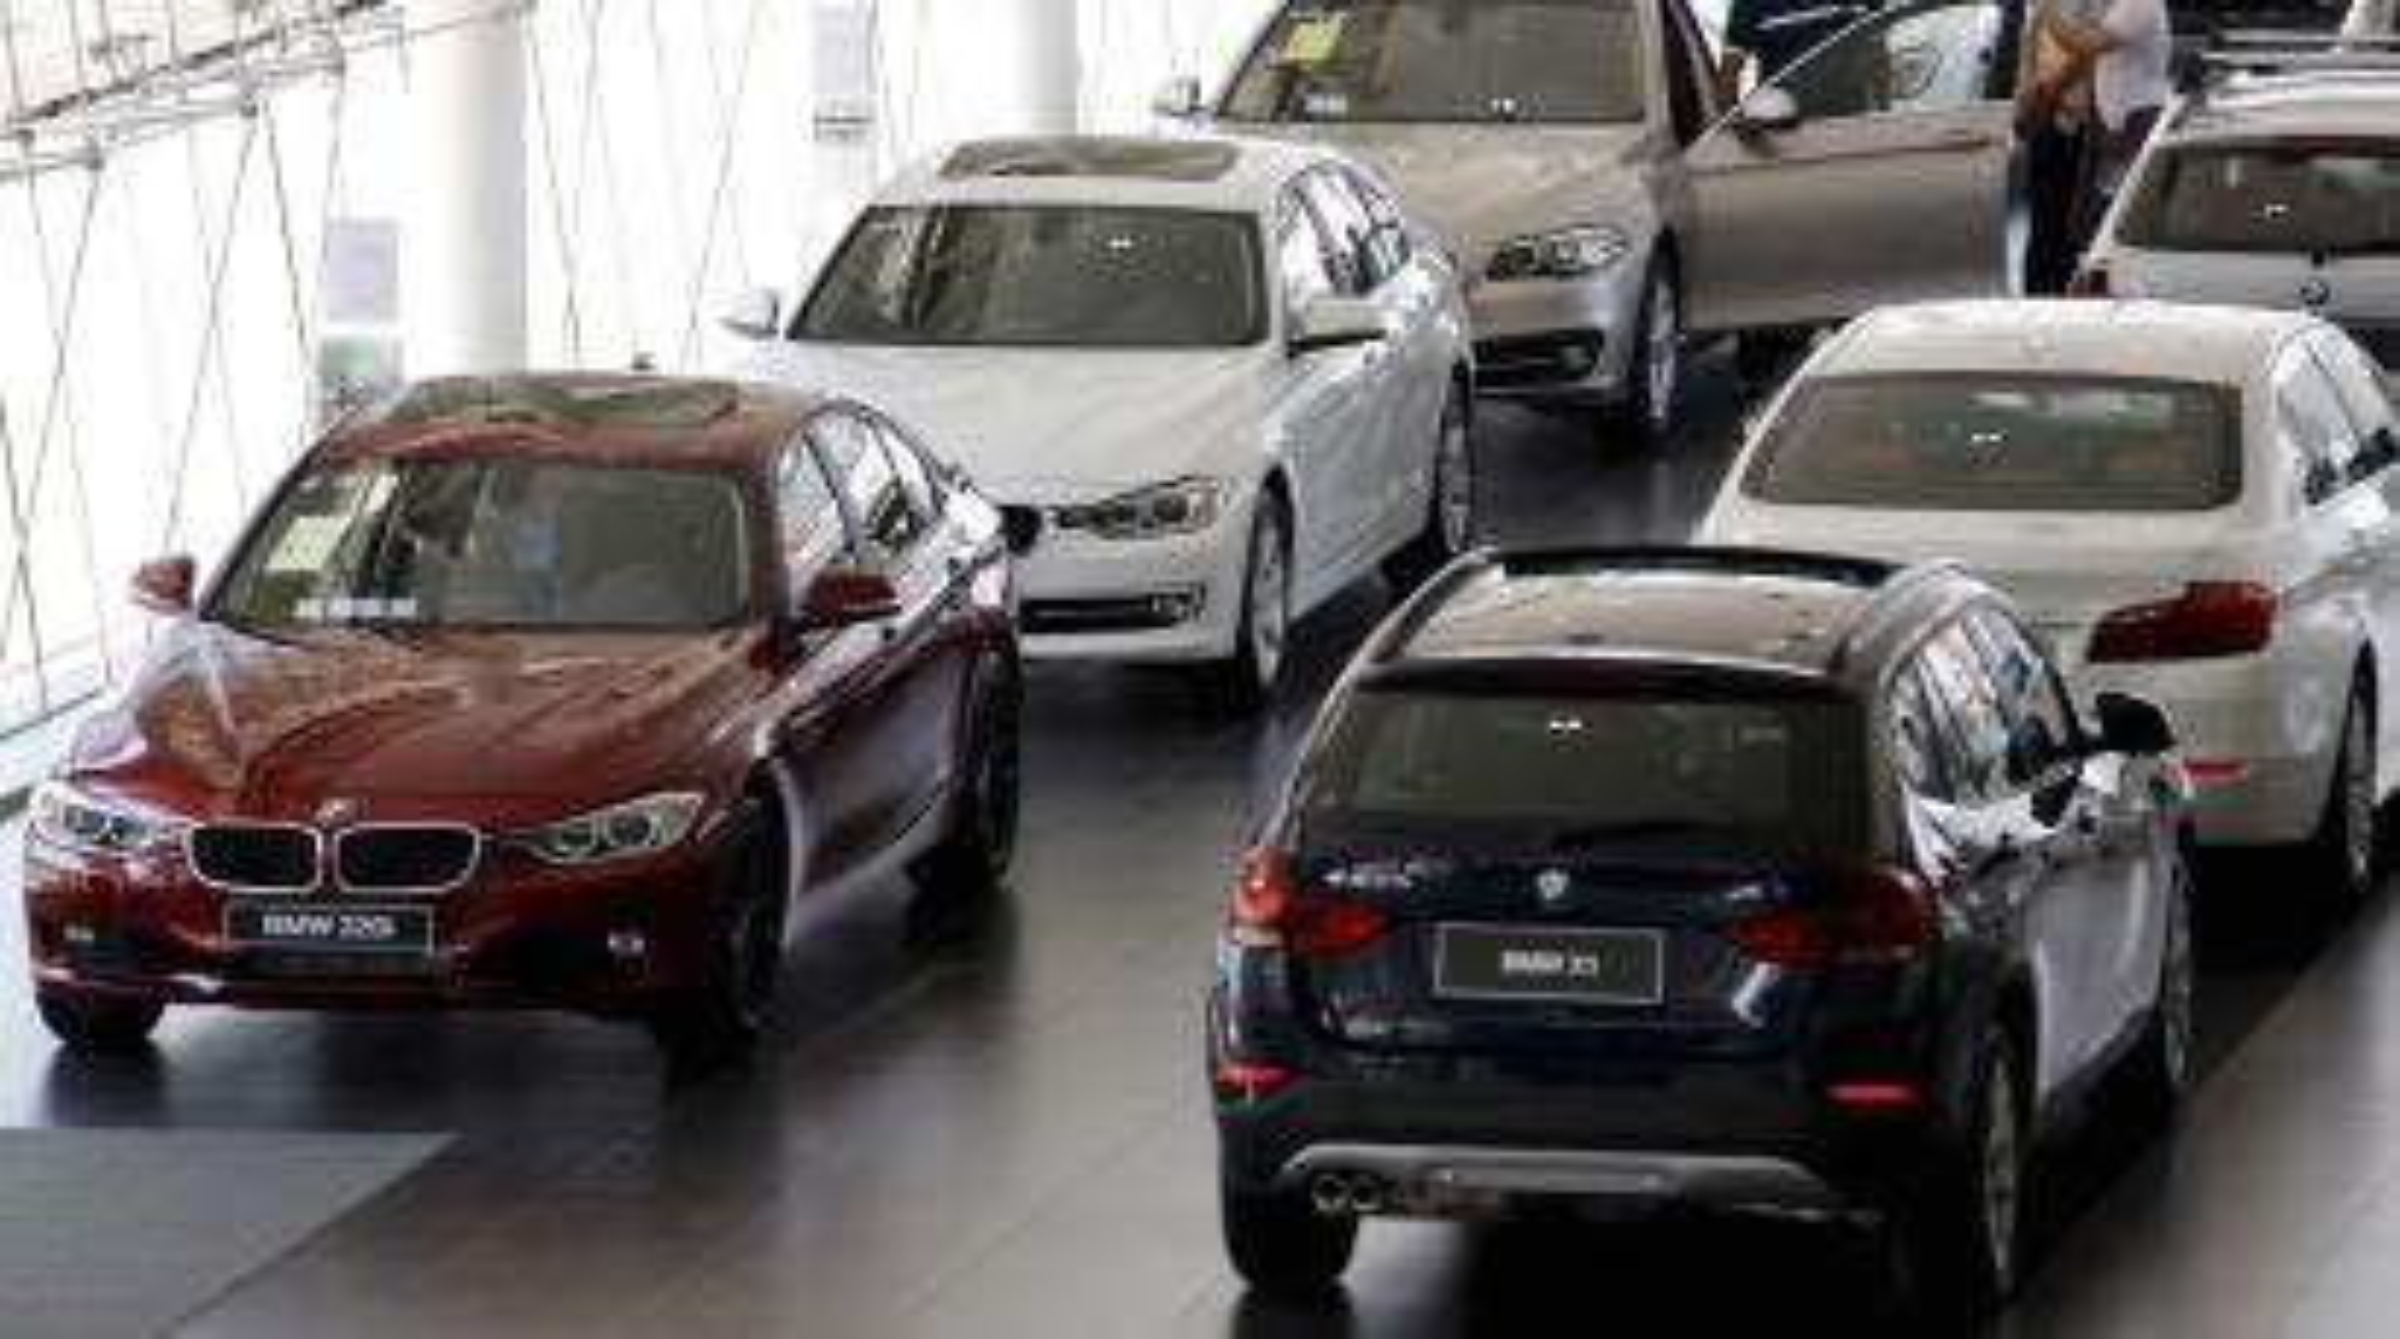 A BMW dealership in Beijing